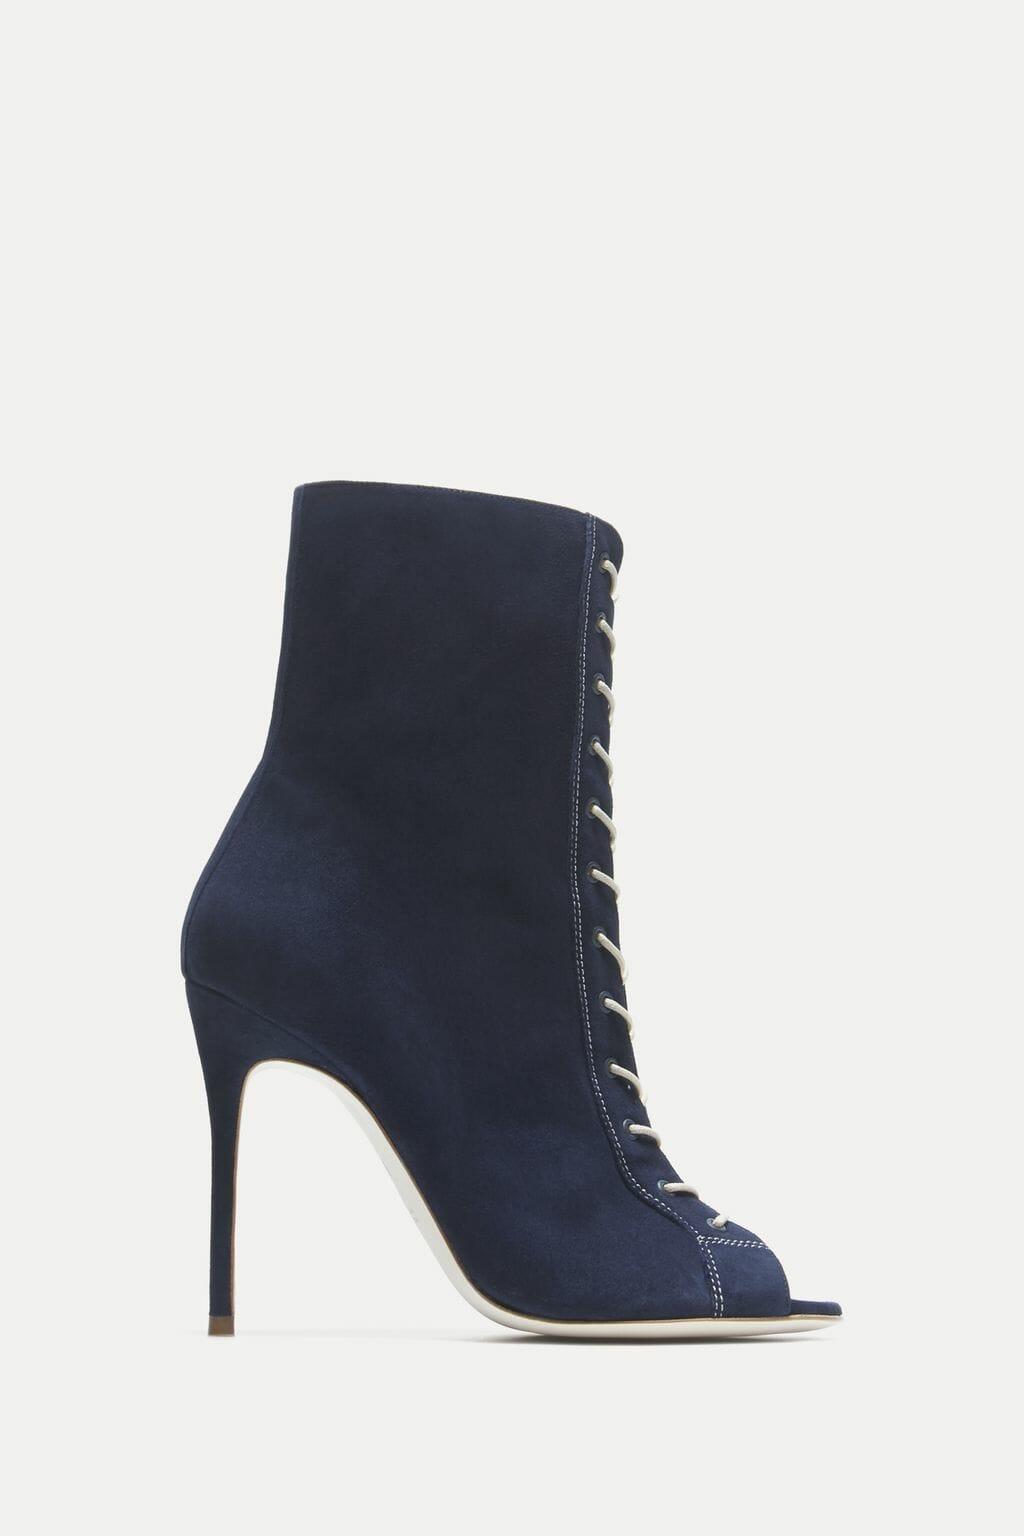 CH-Carolina-herrera-shoes-collection-Spring-Summer-2018-shoe-47